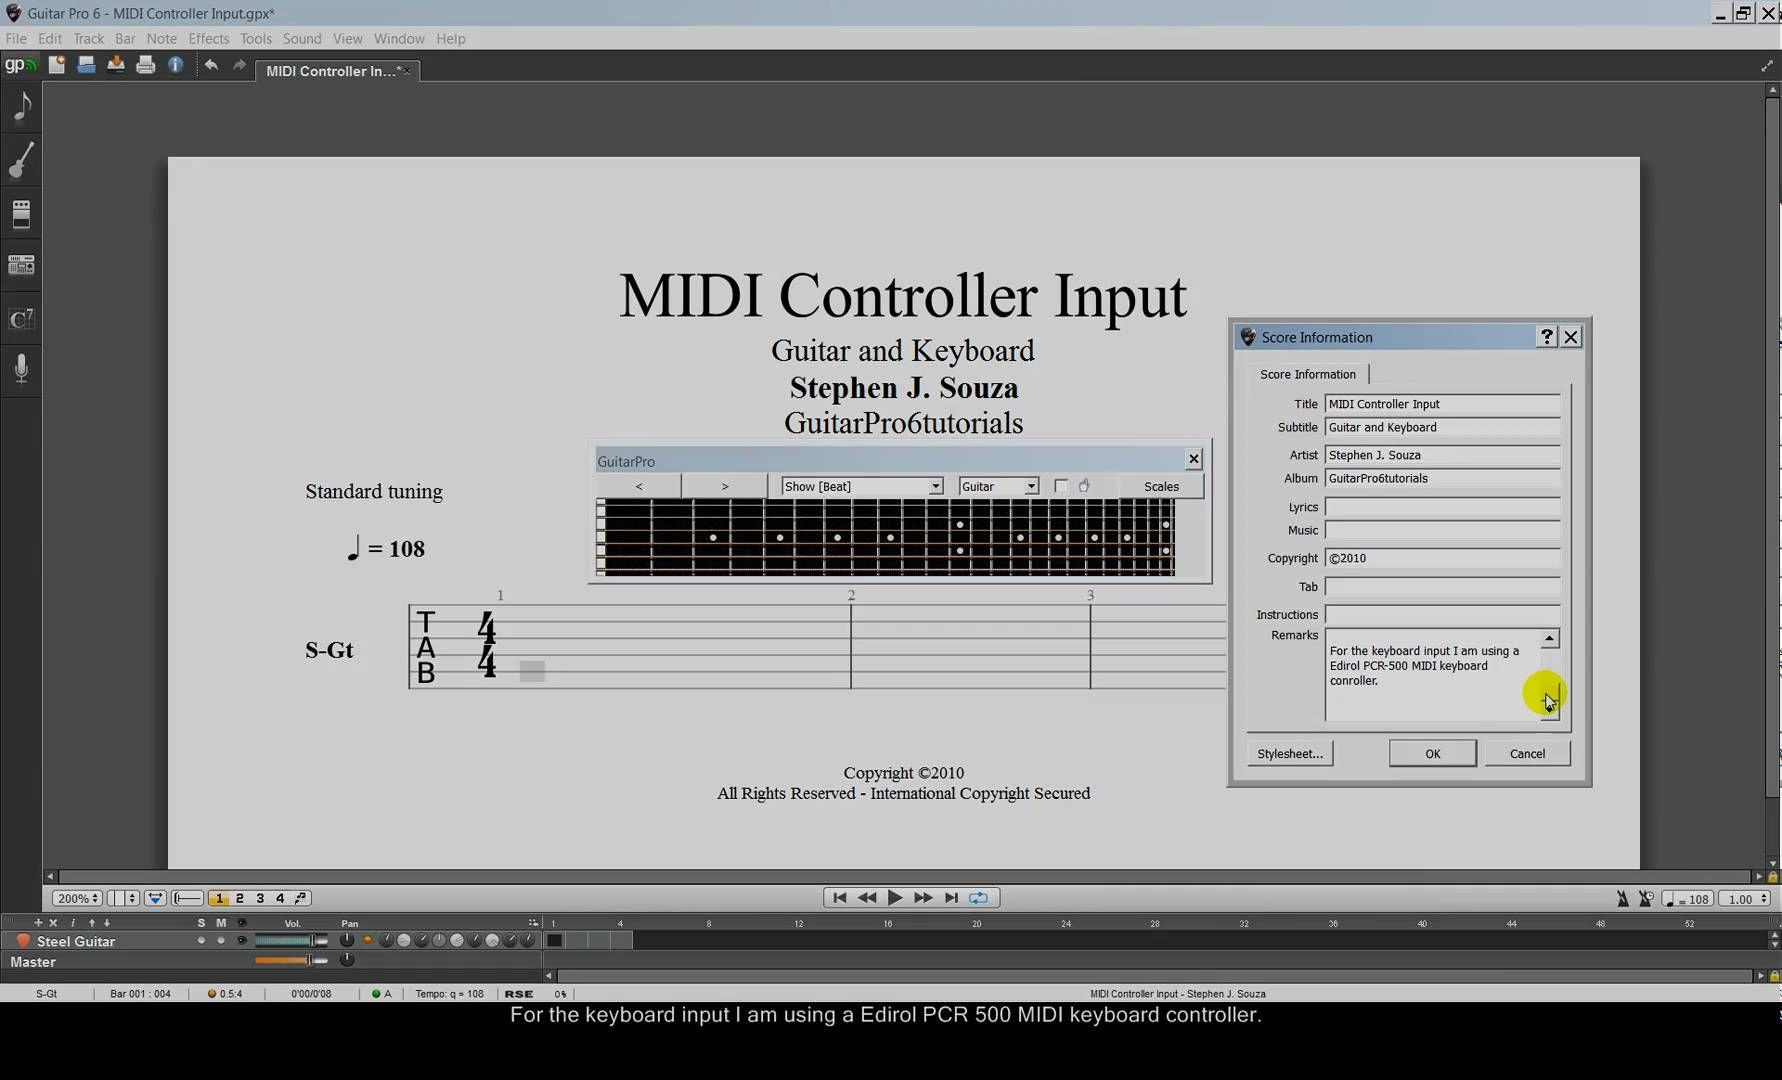 Guitar Pro 6 tutorial MIDI controller input | Software